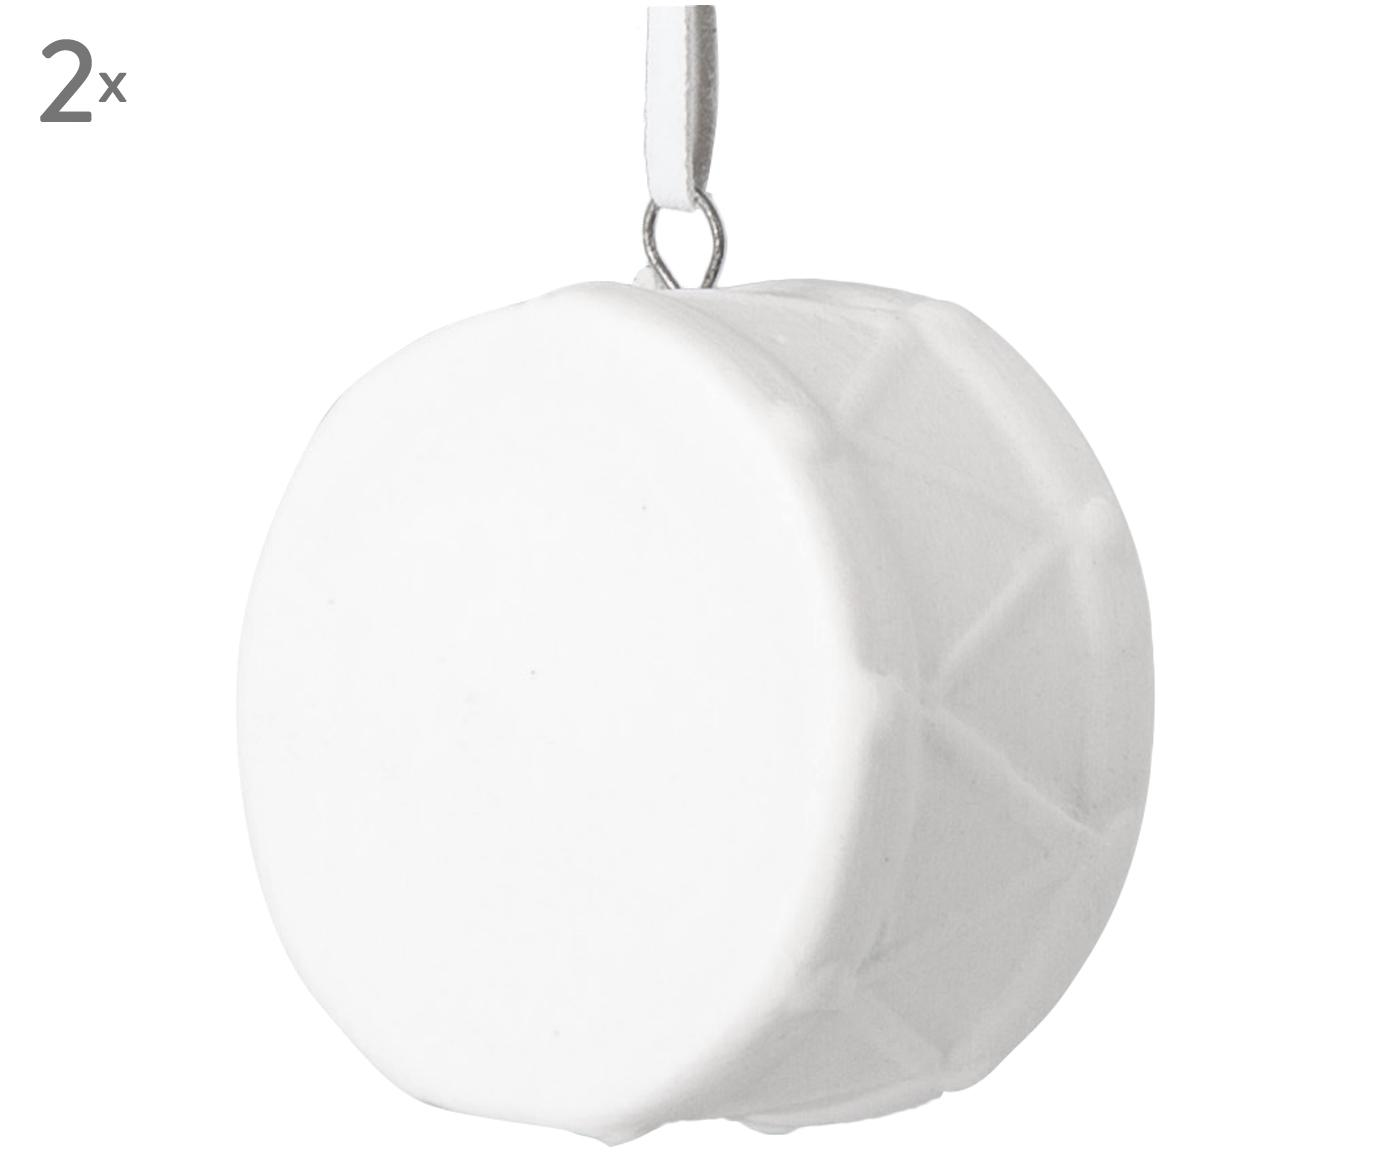 Adorno navideño Drum, 2uds., Cerámica, Blanco, An 3 x Al 5 cm